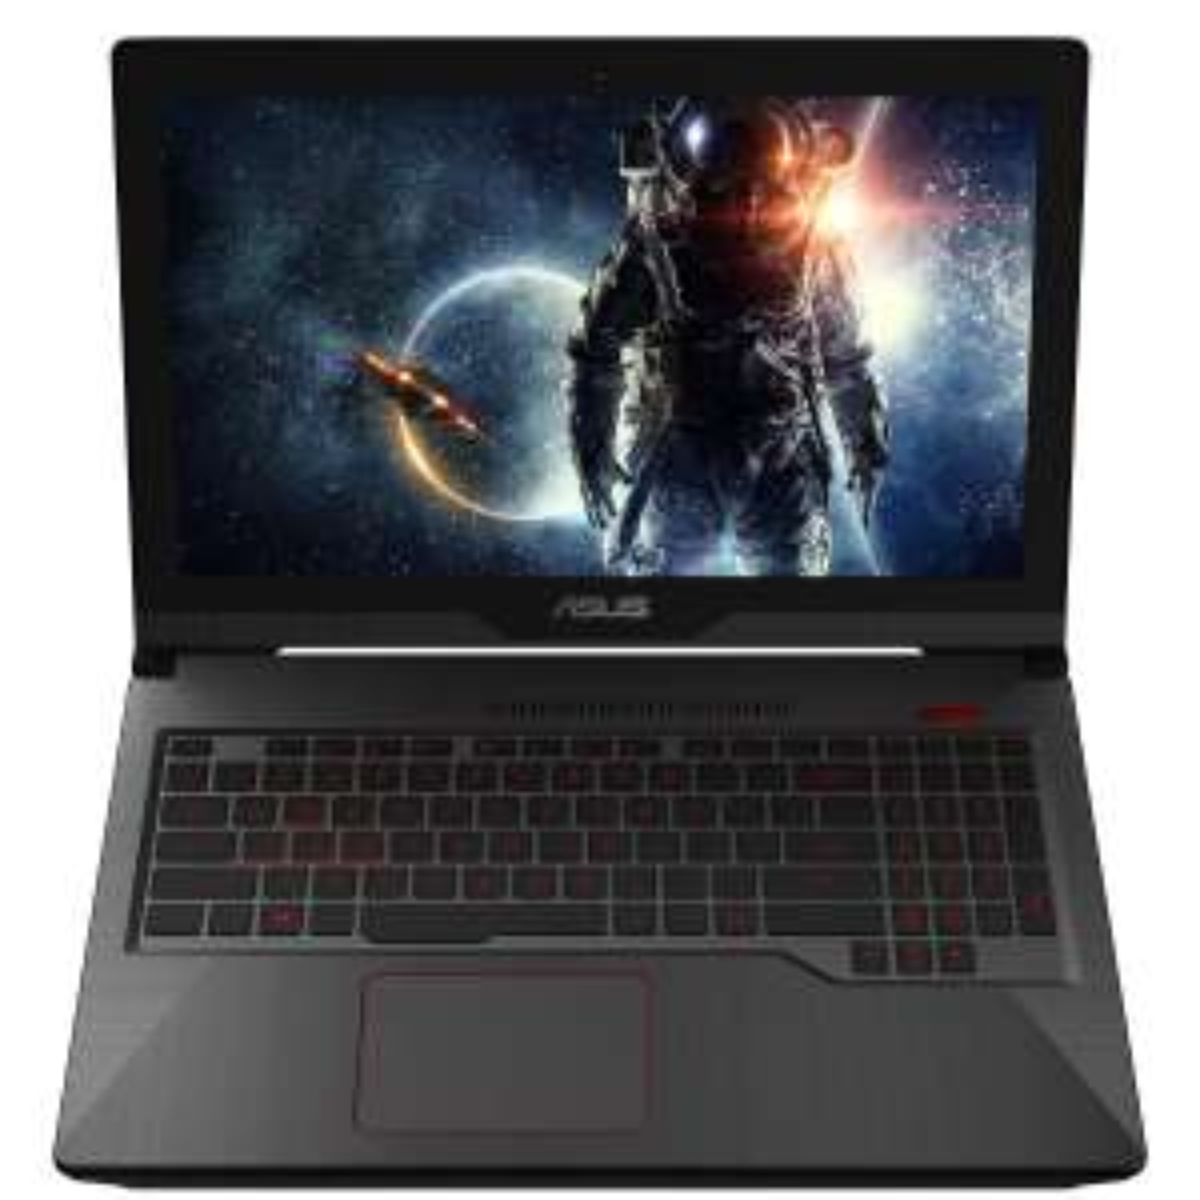 ASUS FX503VM-DM042T 15.6-inch Gaming Laptop (Black) - (Intel i5-7300HQ Processor, Nvidia GTX 1060 Dedicated Graphics, 8GB RAM, 1TB HDD + 128GB SSD, Windows 10